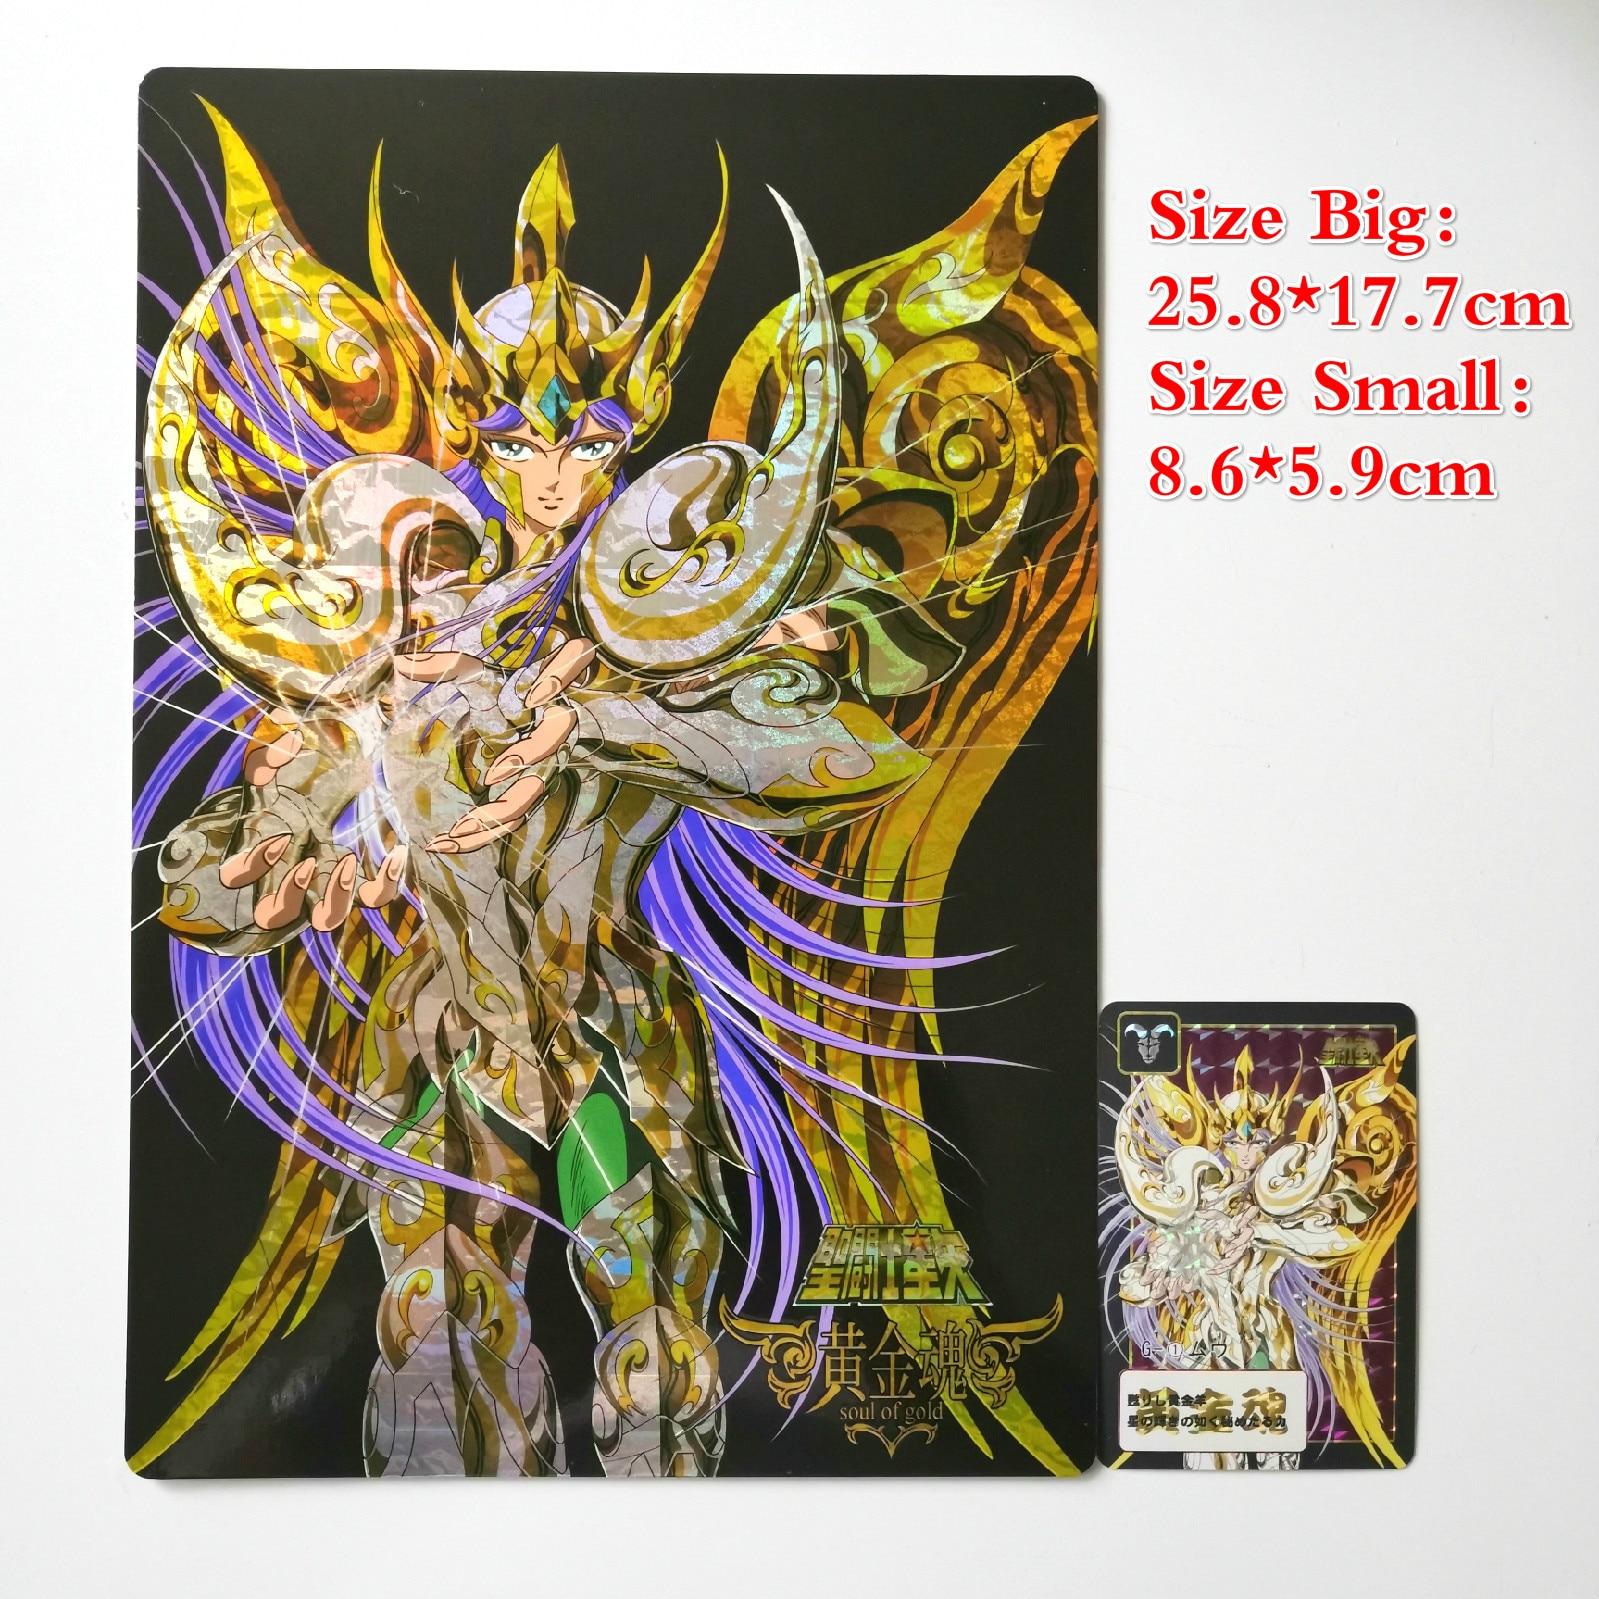 12pcs/set Saint Seiya 25.8*17.7cm Toys Hobbies Hobby Collectibles Game Collection Anime Cards